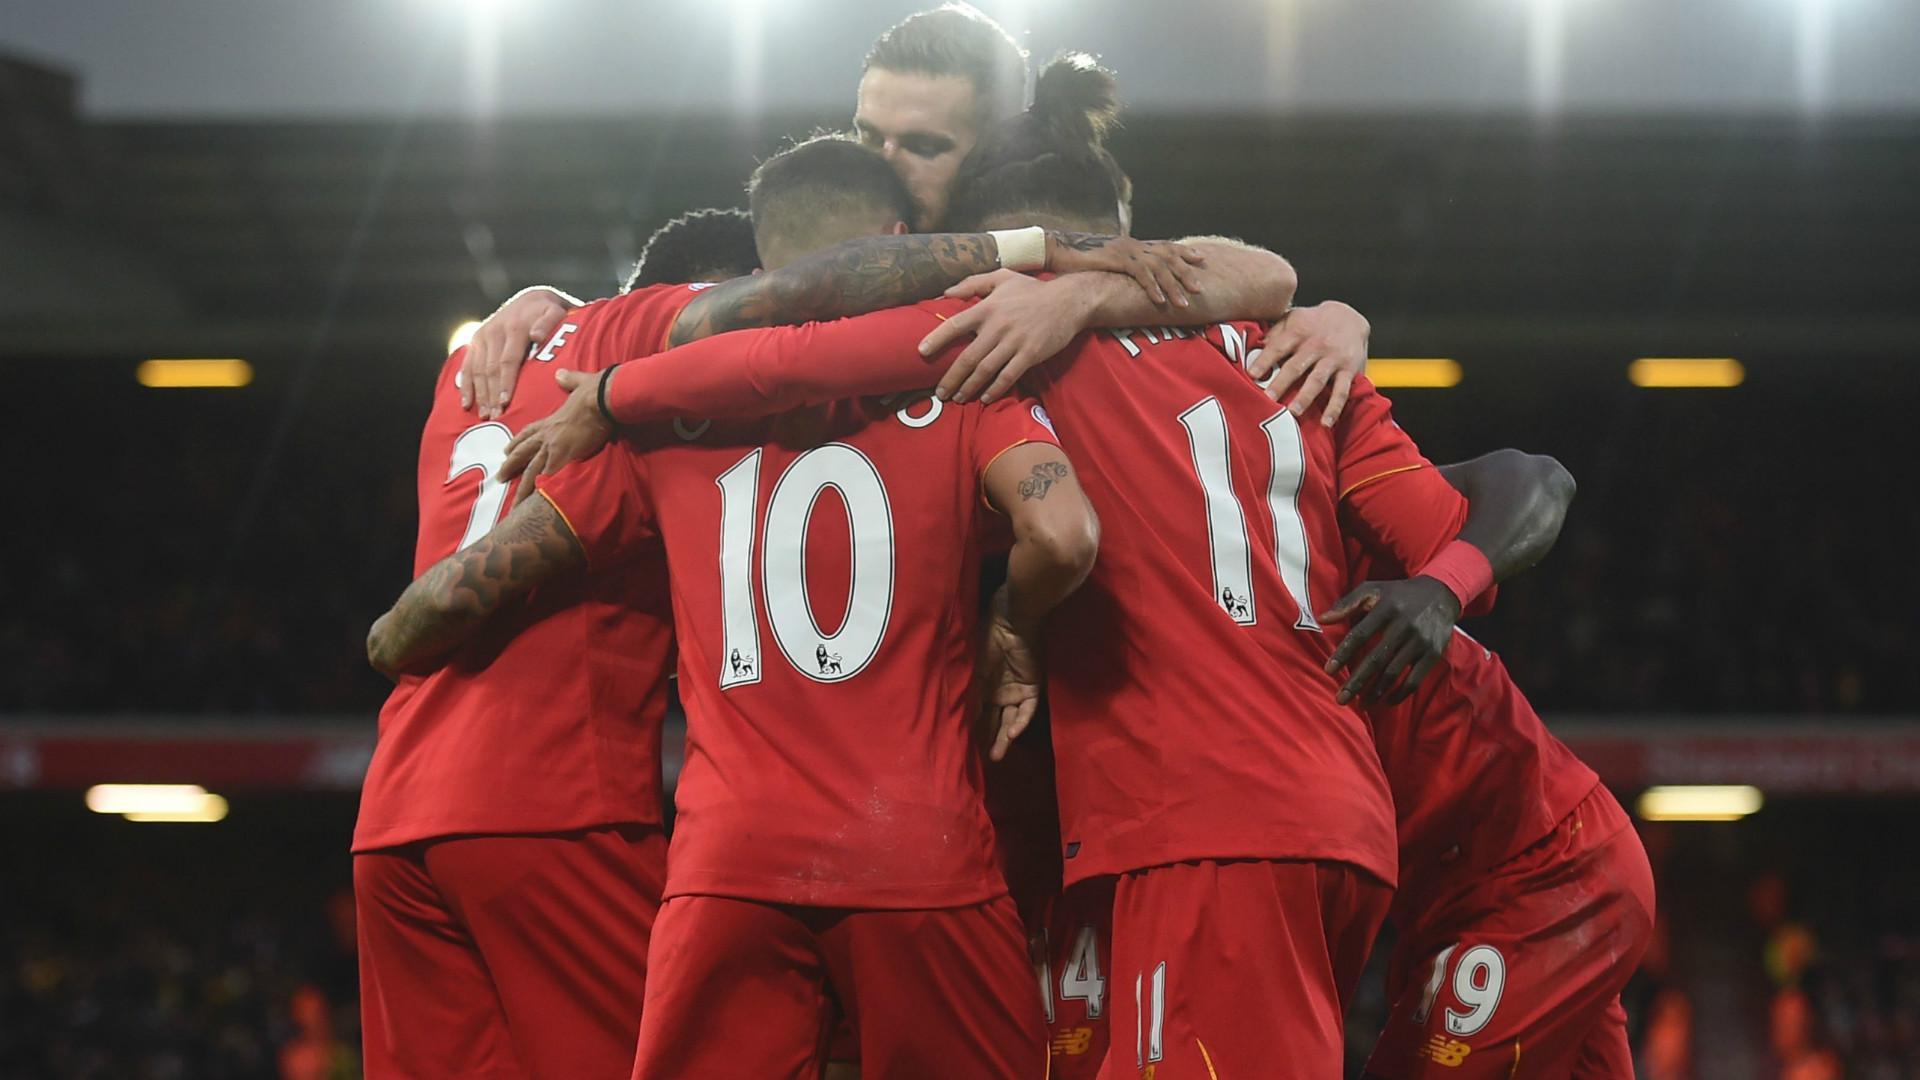 Liverpool celebrate v Watford 6-1